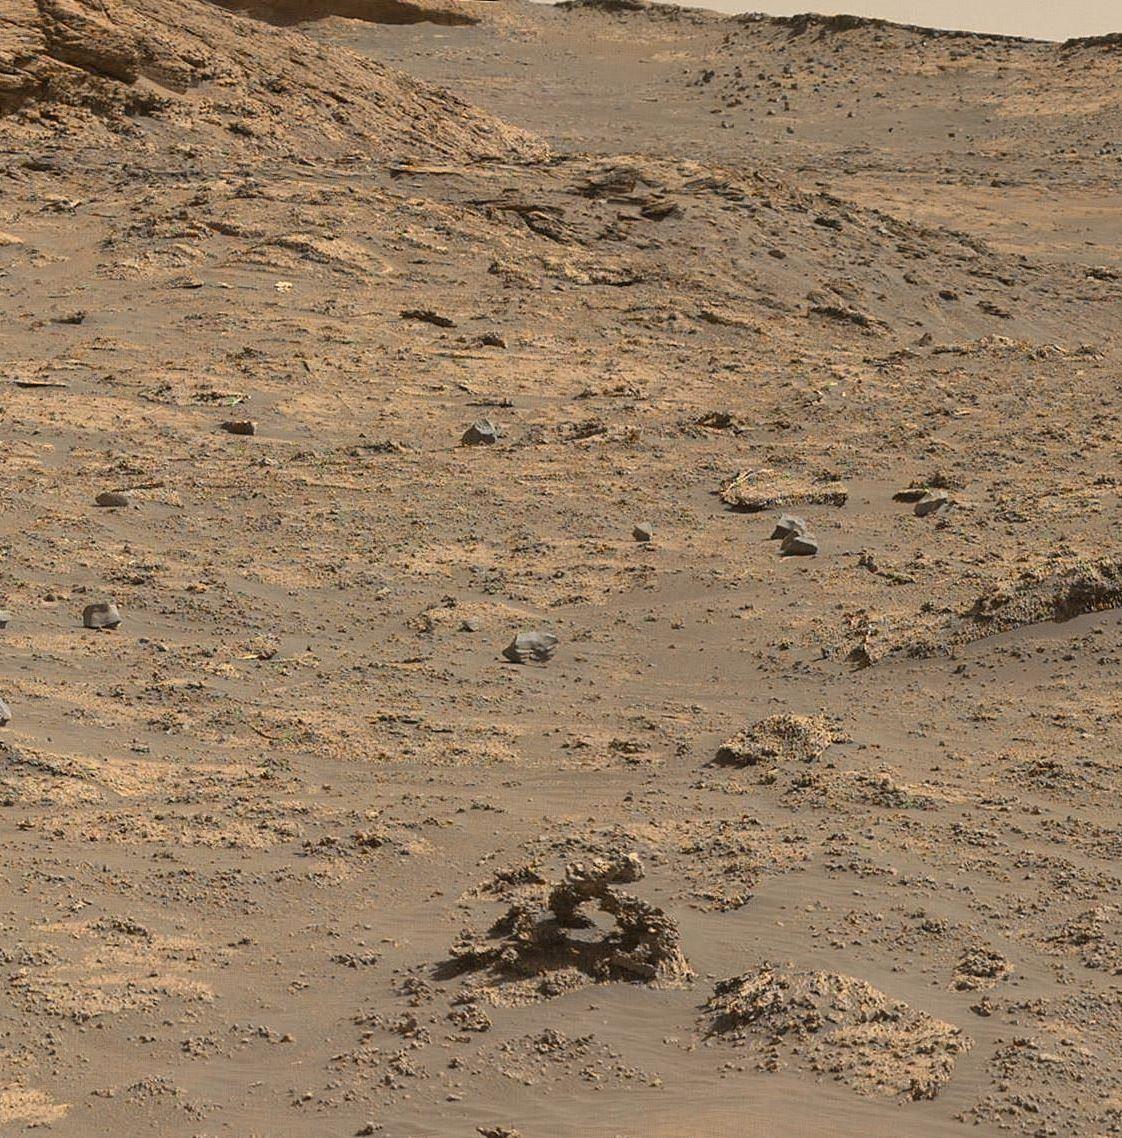 Арка на Марсе. Фото: NASA